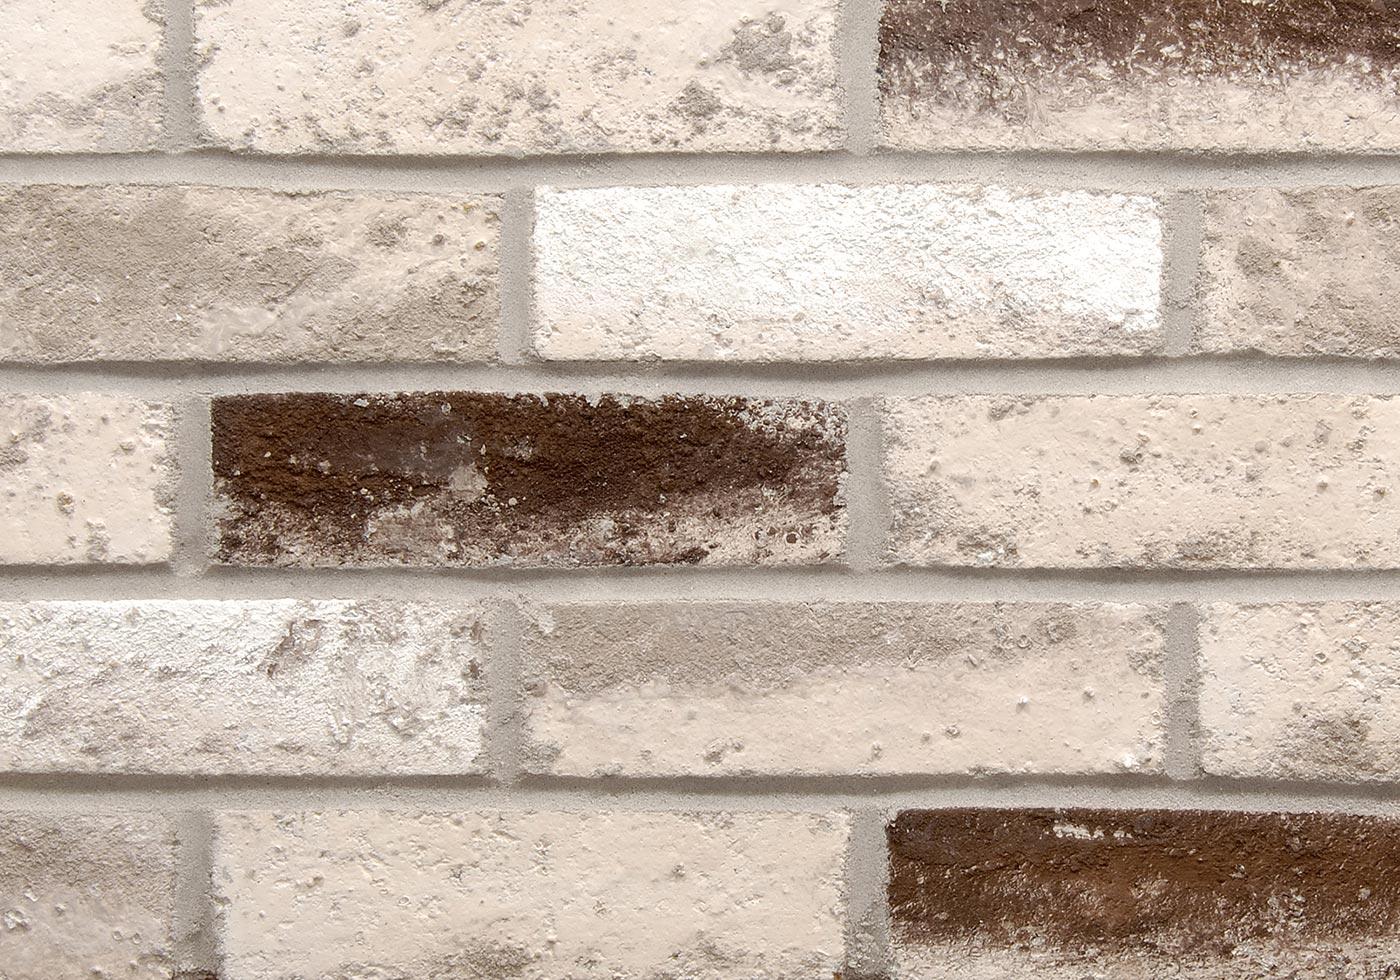 Bristol brick close-up